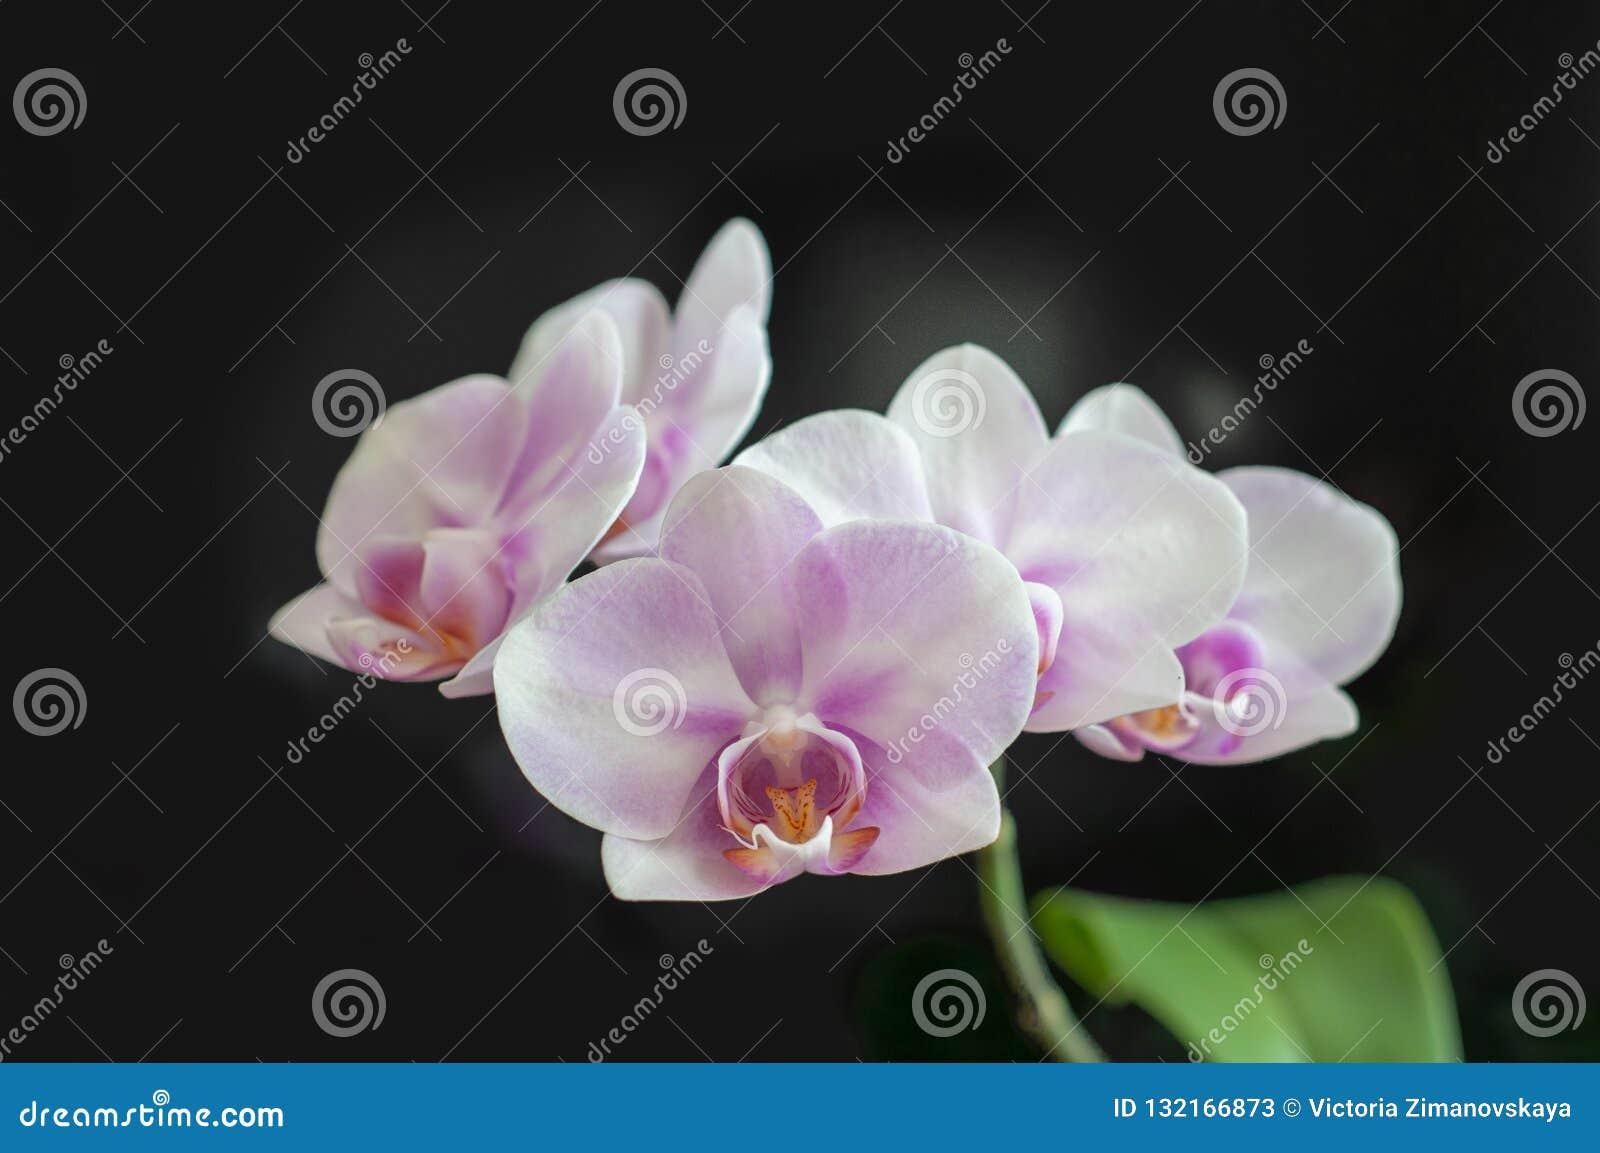 Flowers Orchid Phalaenopsis Miki Sakura close-up on dark background